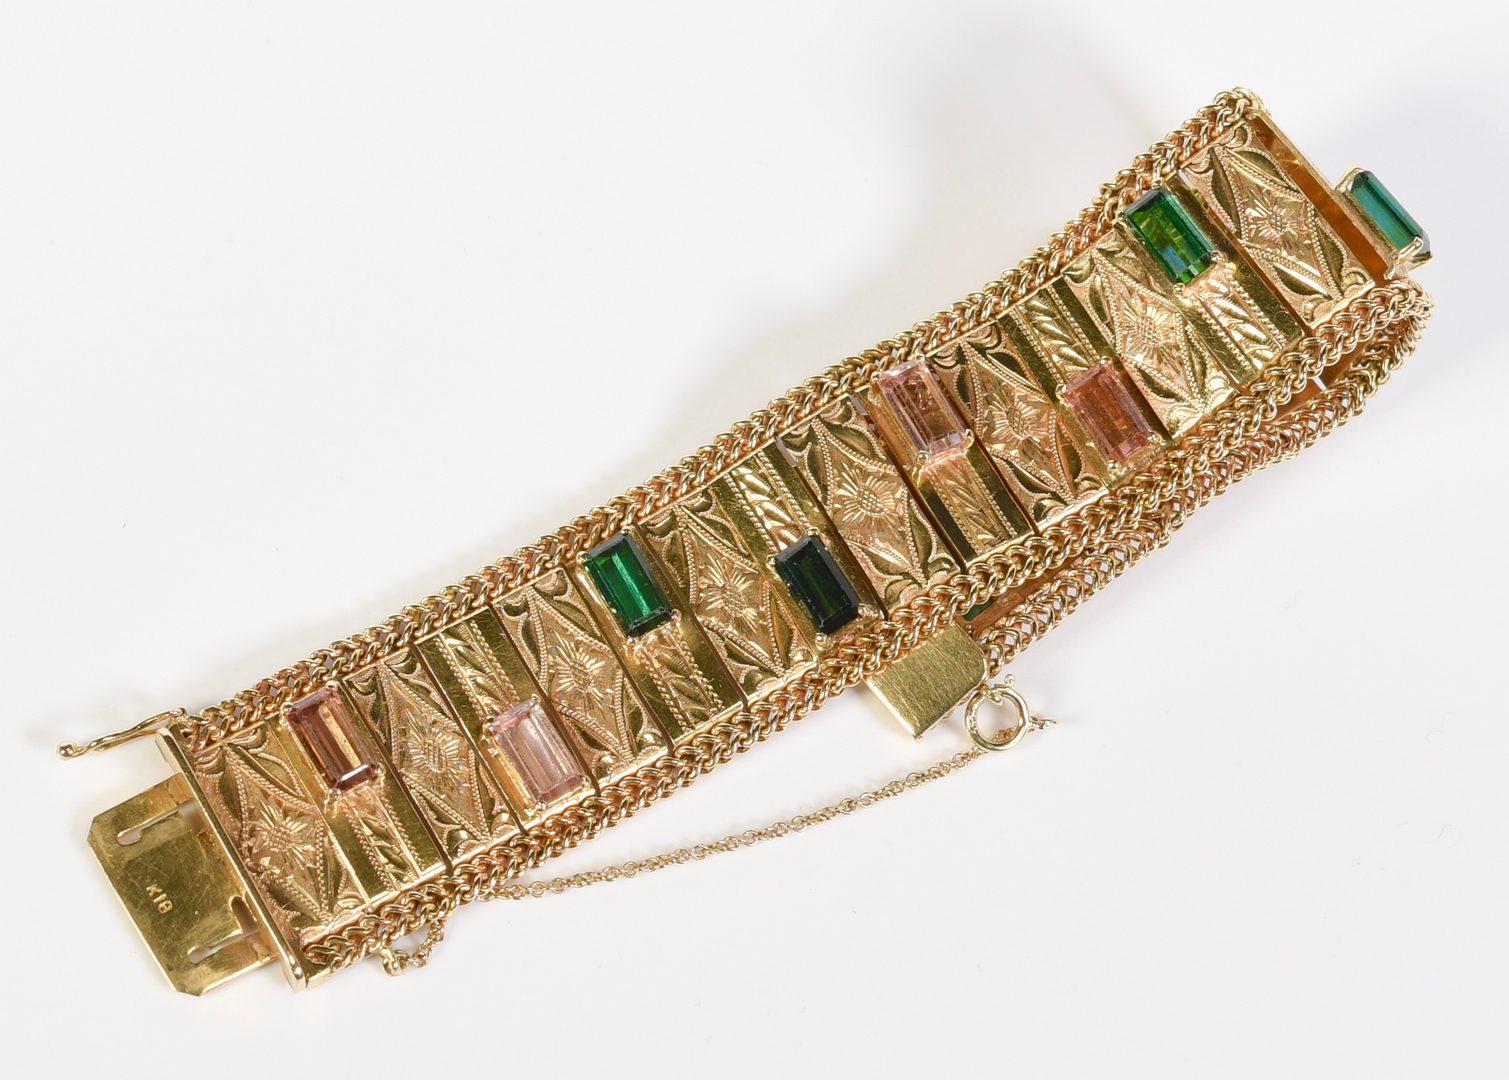 Lot 58: 18K Vintage Tourmaline Bracelet, 63.2 grams